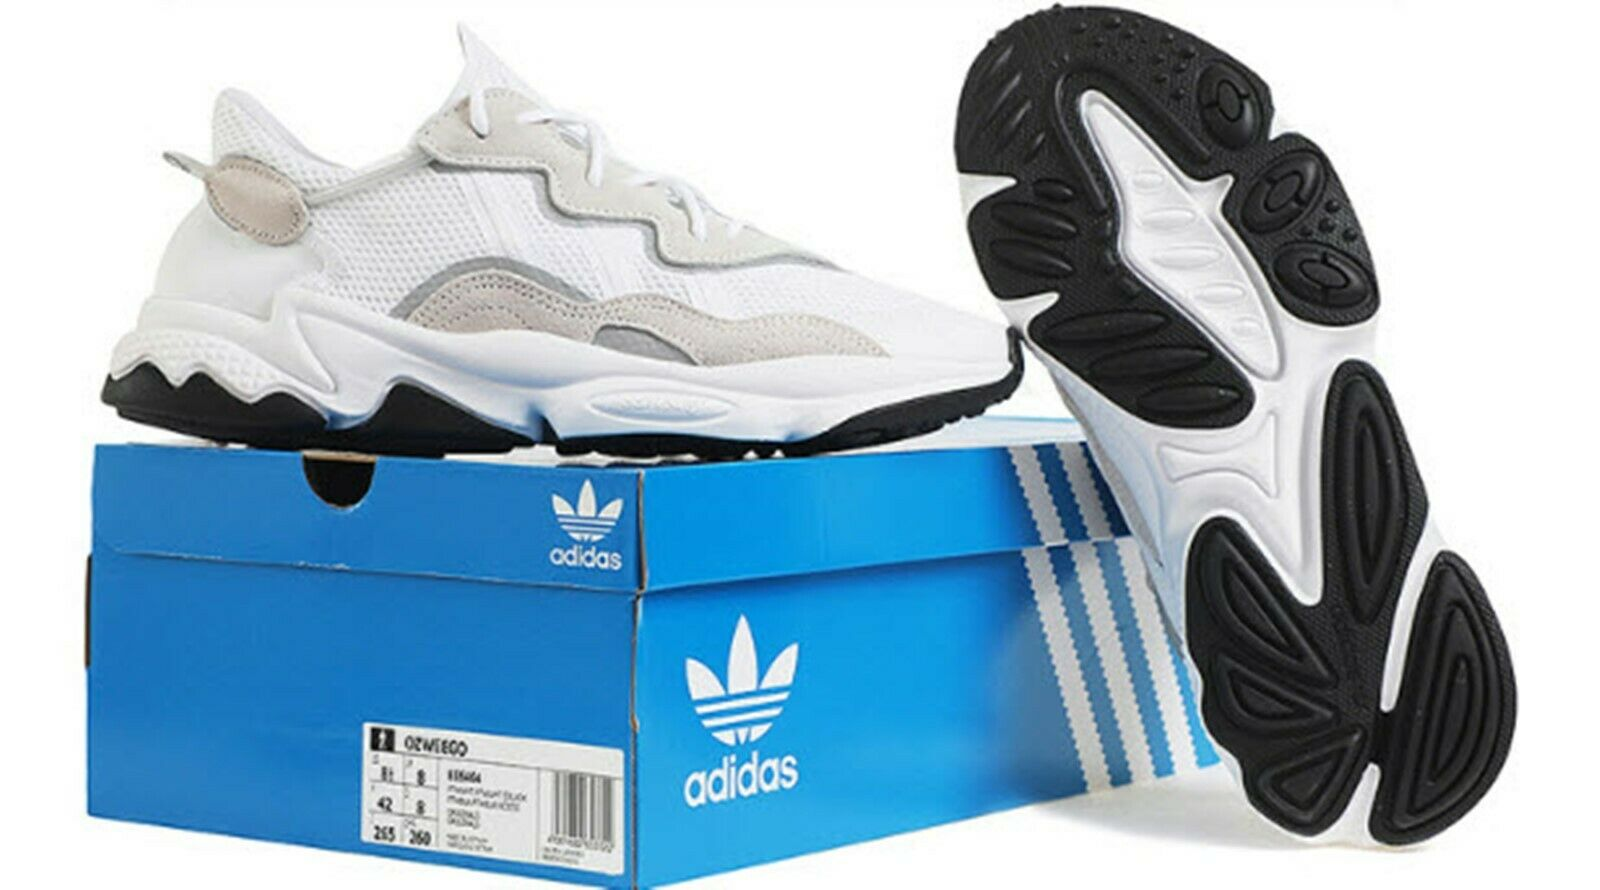 Adidas Men OZWEAGO  Scarpe Running bianca Training scarpe da ginnastica GYM Casual scarpe EE6464  risparmia fino al 70%